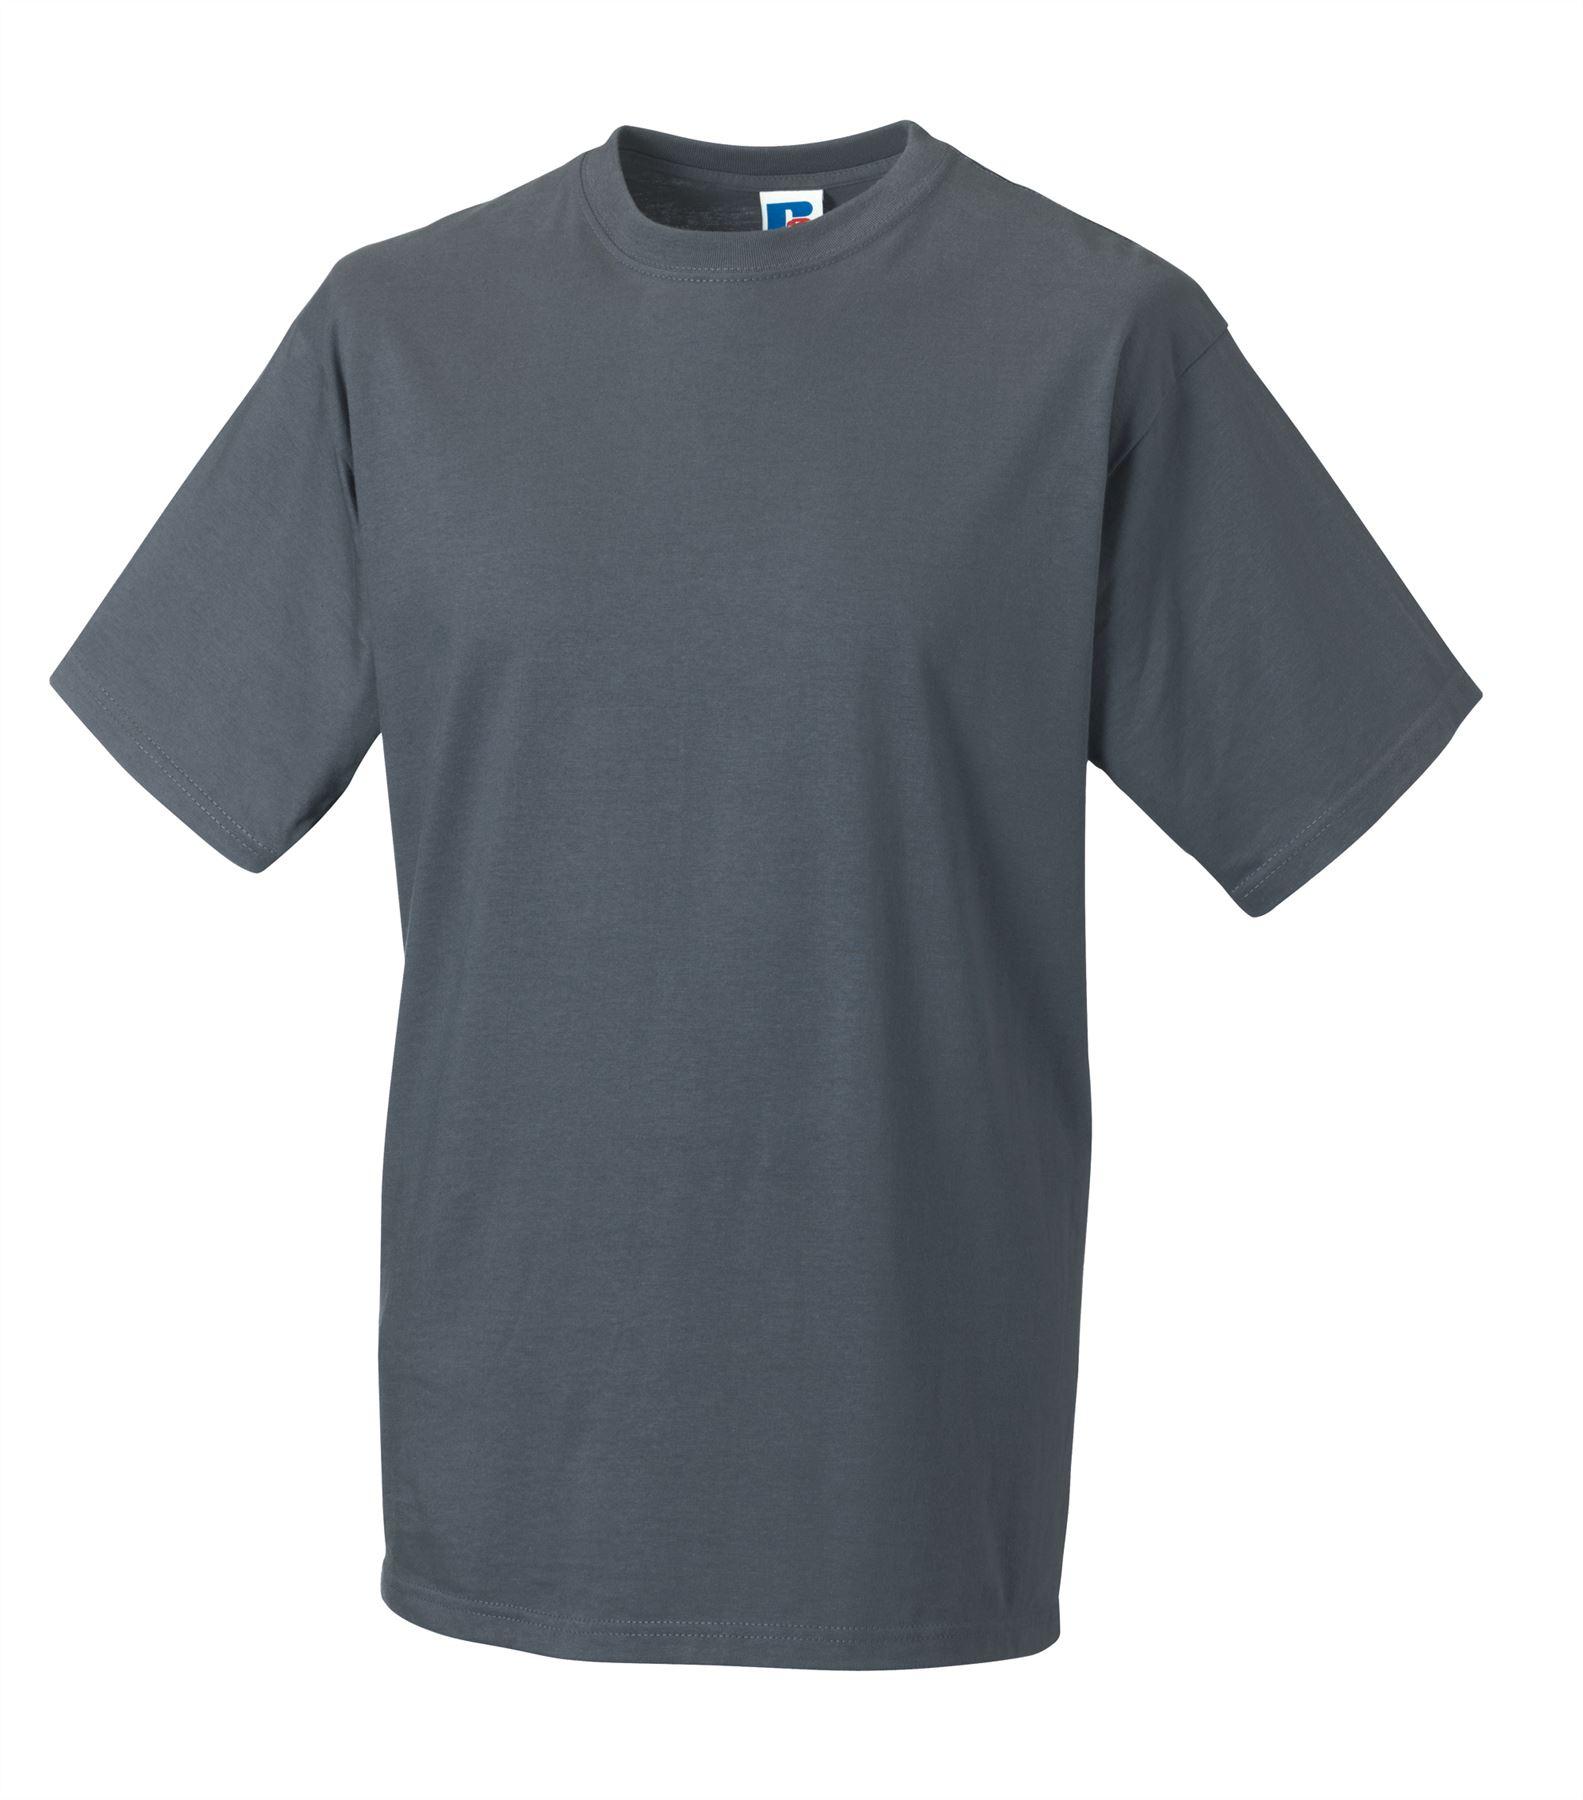 Russell-Super-ringspun-classic-t-shirt